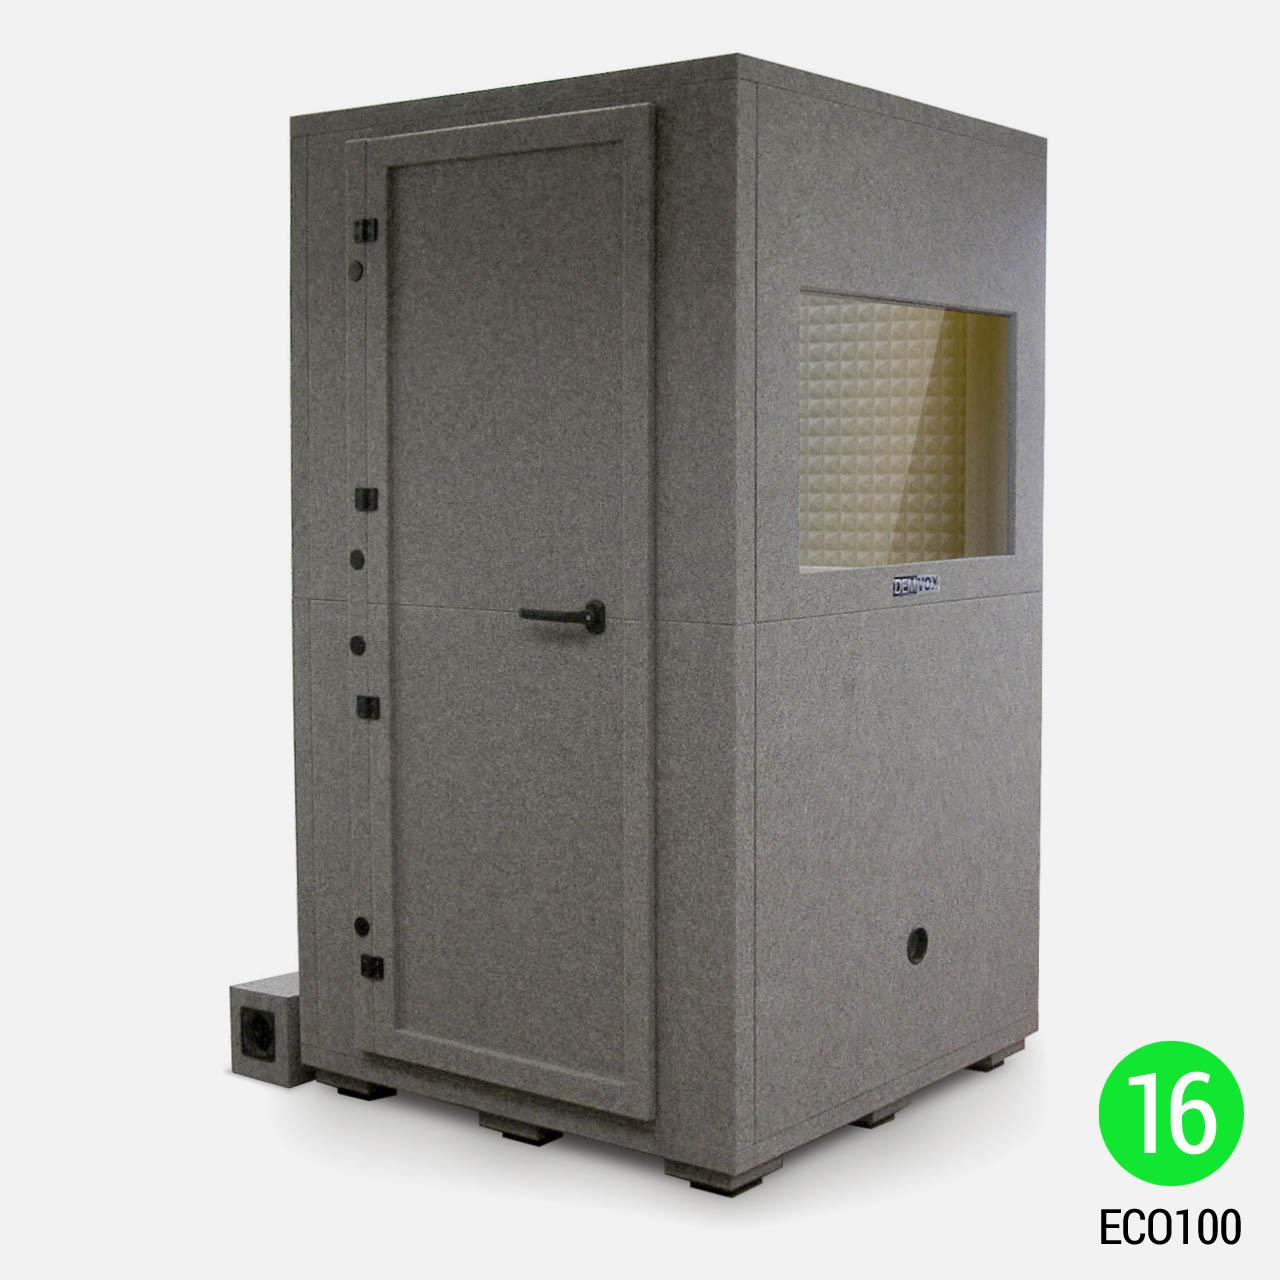 BOOTHGUARD - ECO100 - DEMVOX